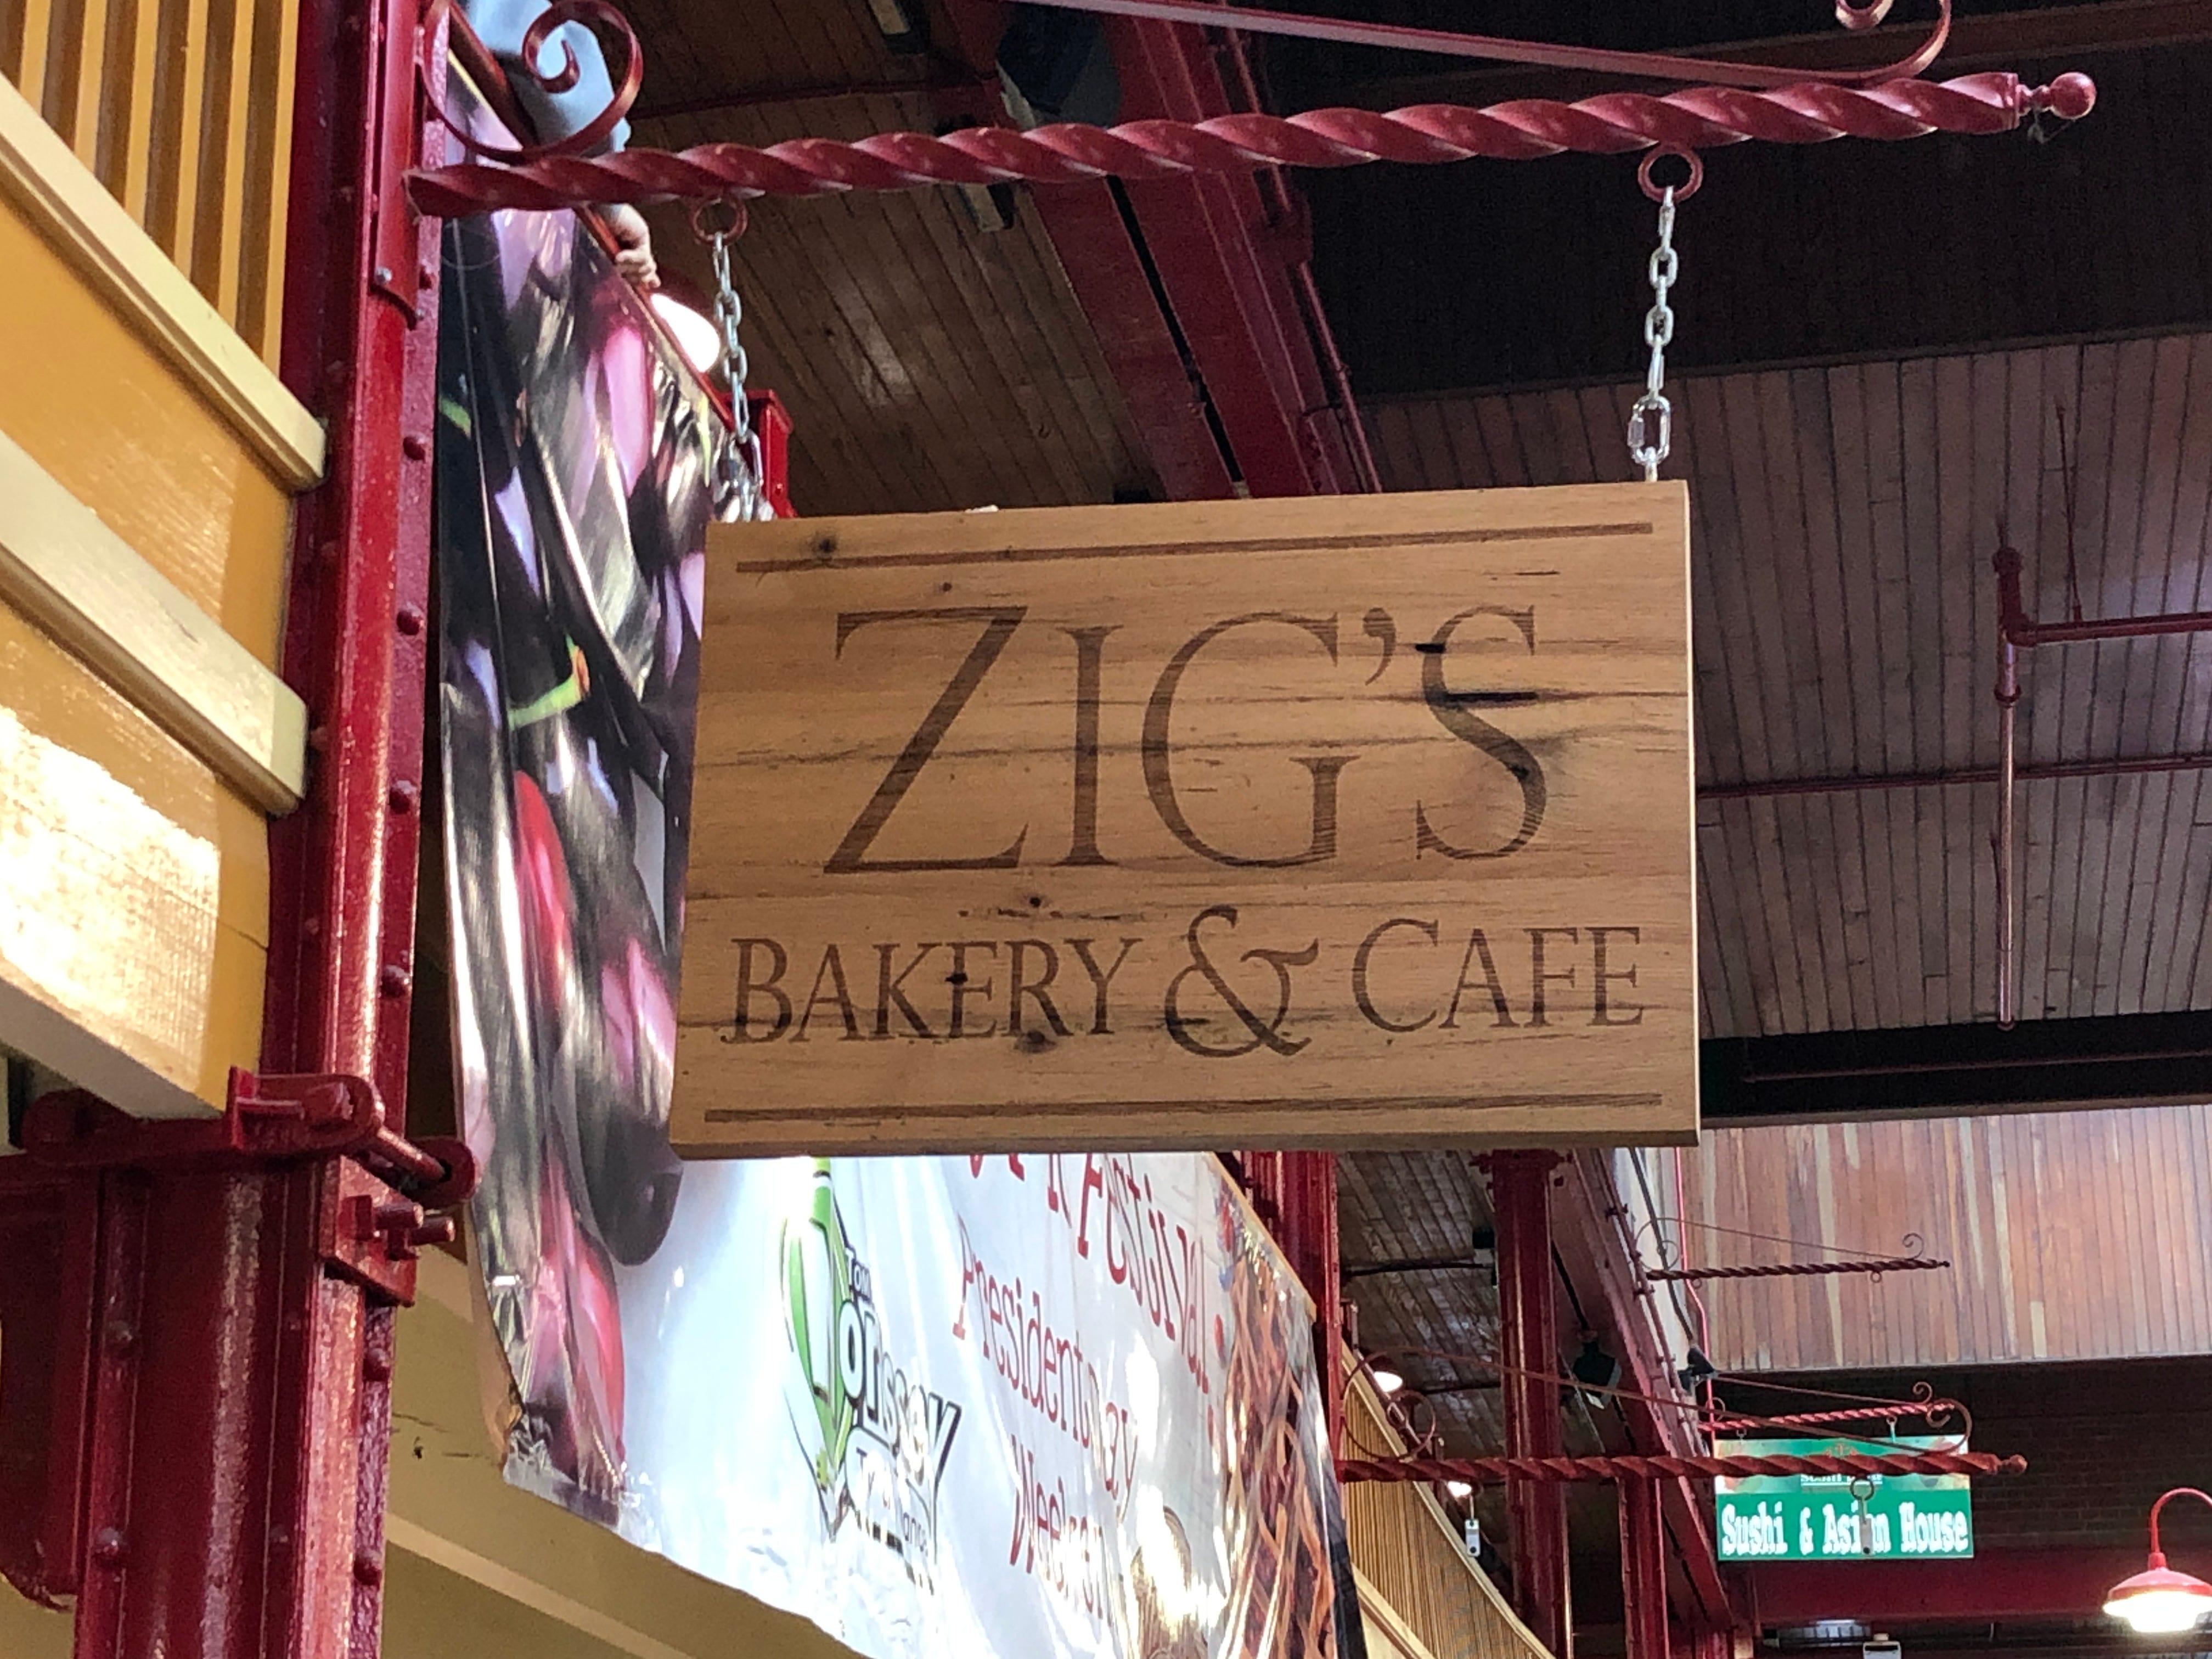 Zig's Bakery inside the Lebanon Farmers Market baked the 500 pounds of cherry pie for the Community of Lebanon Association's fundraiser.